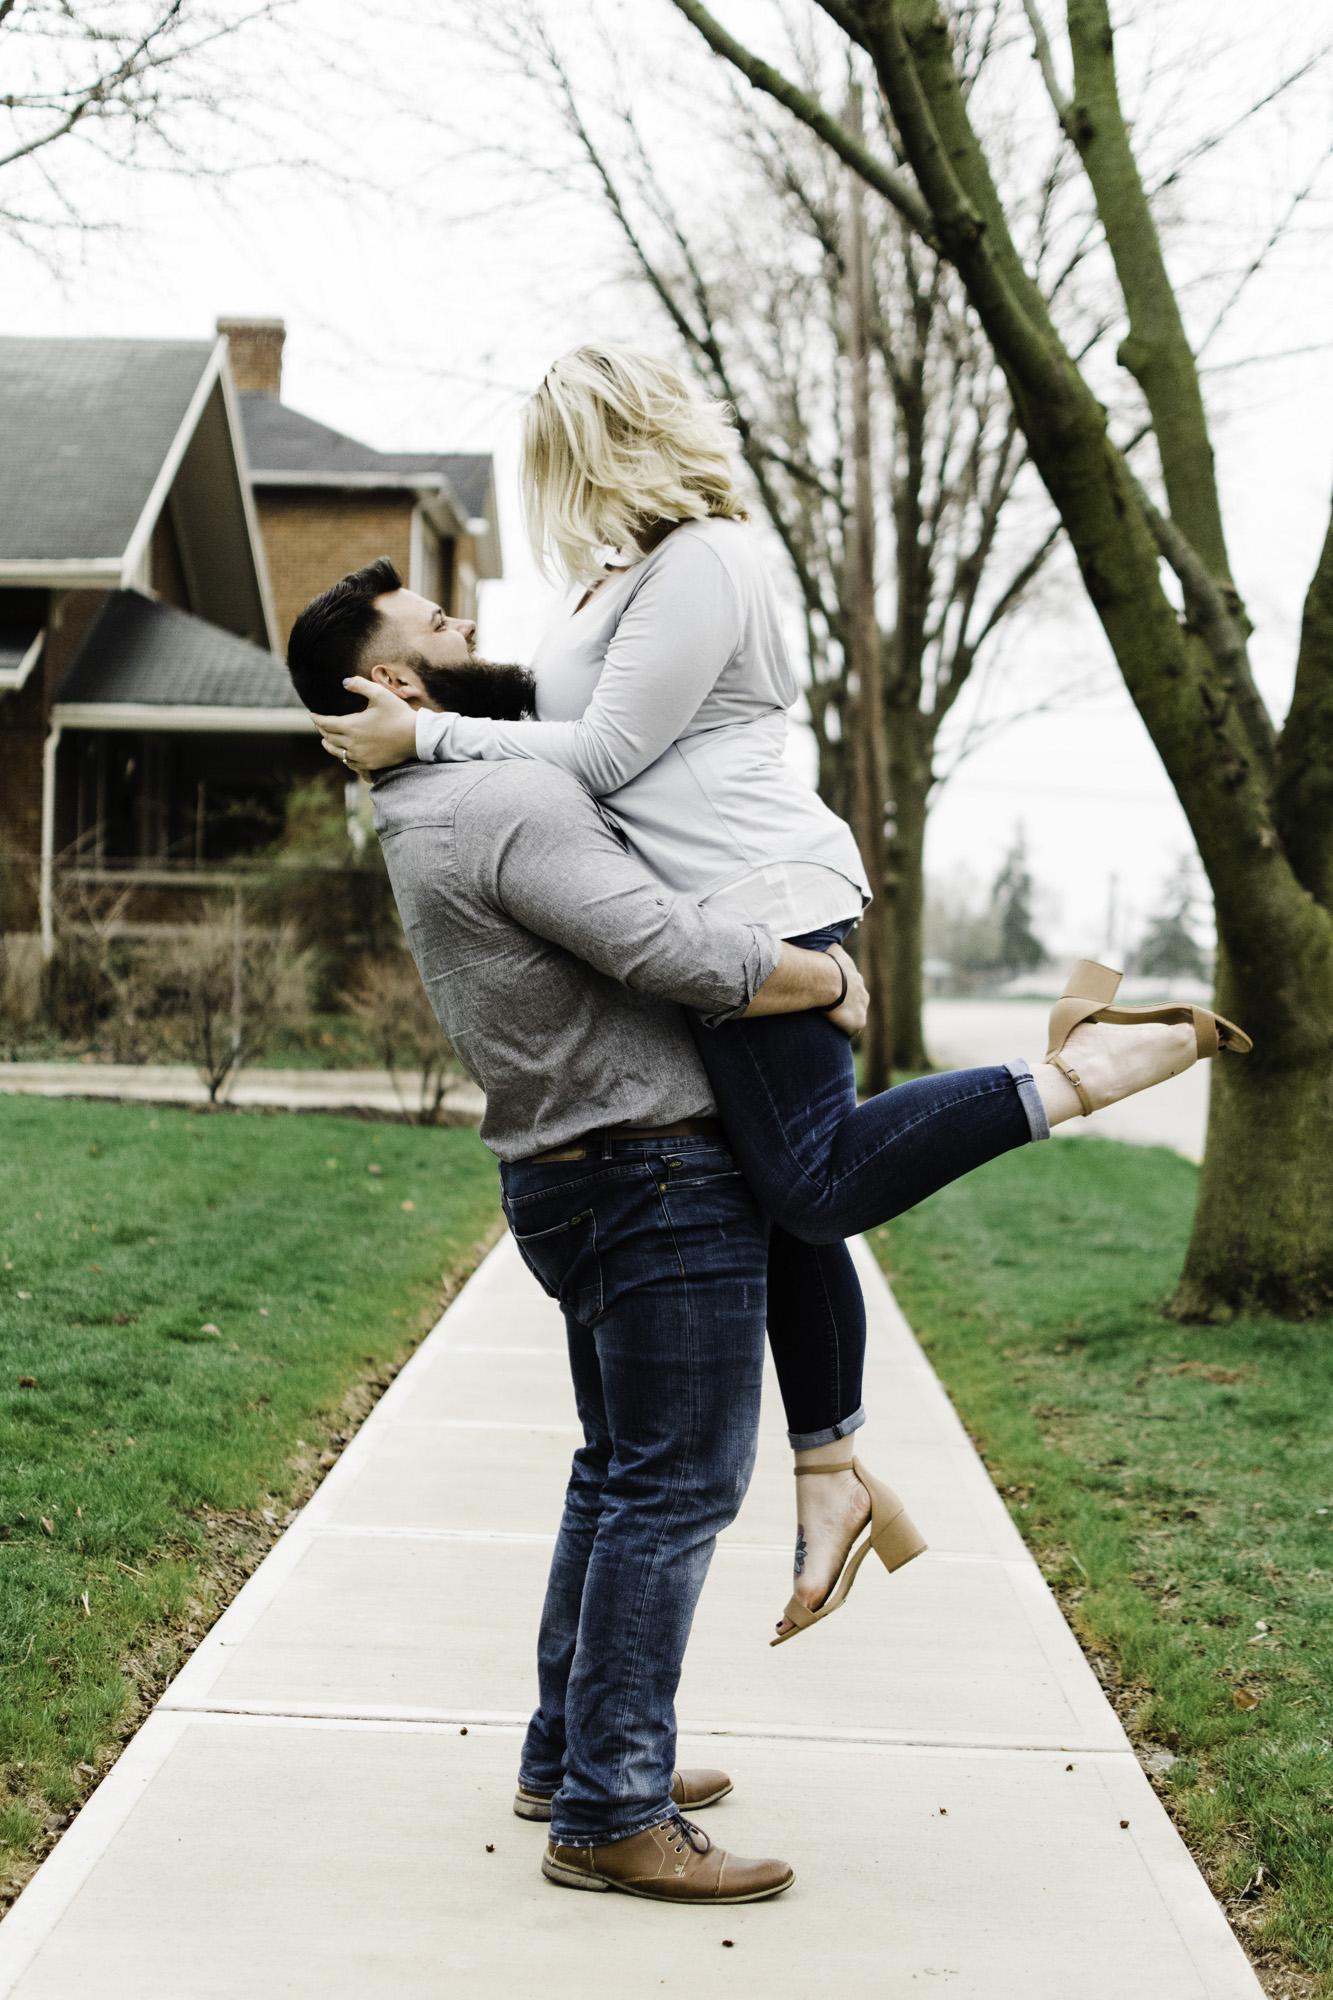 Cate_Ann_Photography_Dayton_Ohio_Wedding_And_Engagement_PhotographerDSC_2936.jpg